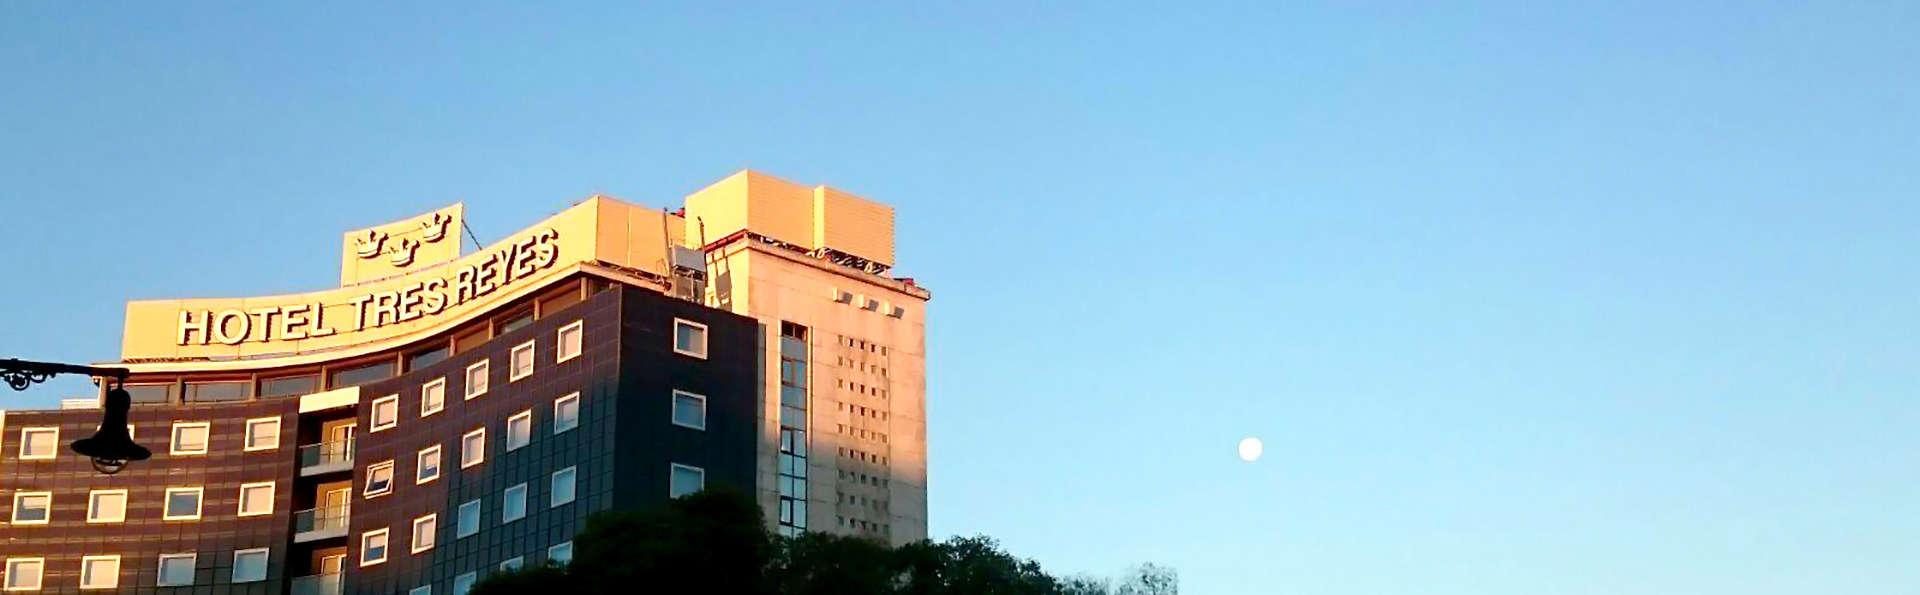 Hotel Tres Reyes  - Edit_Front.jpg